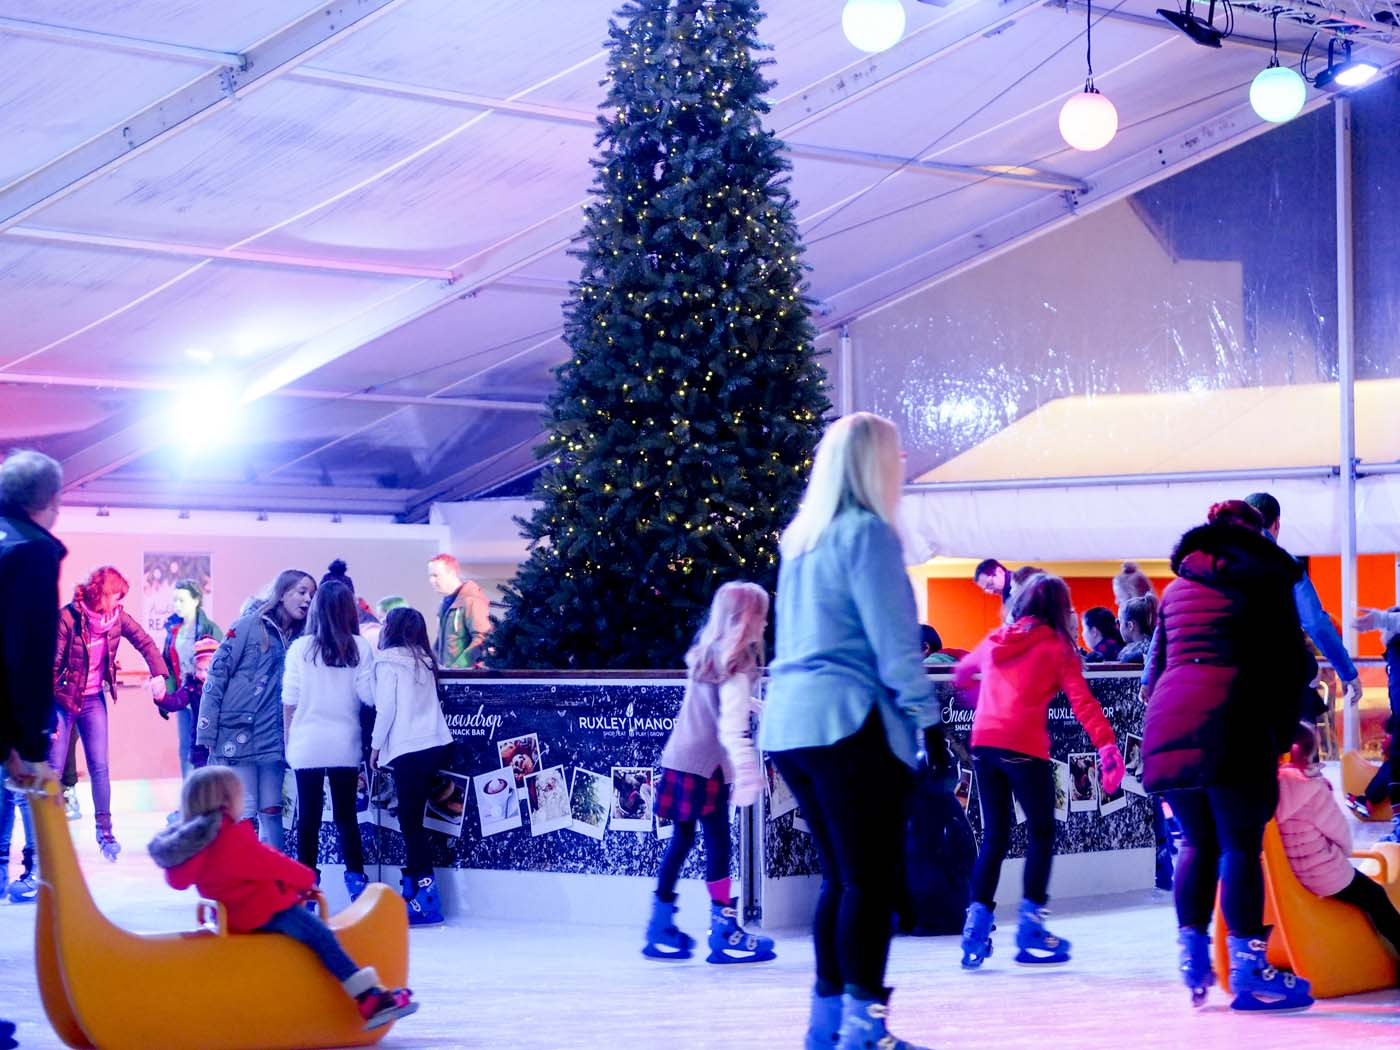 Ruxley Manor ice rink